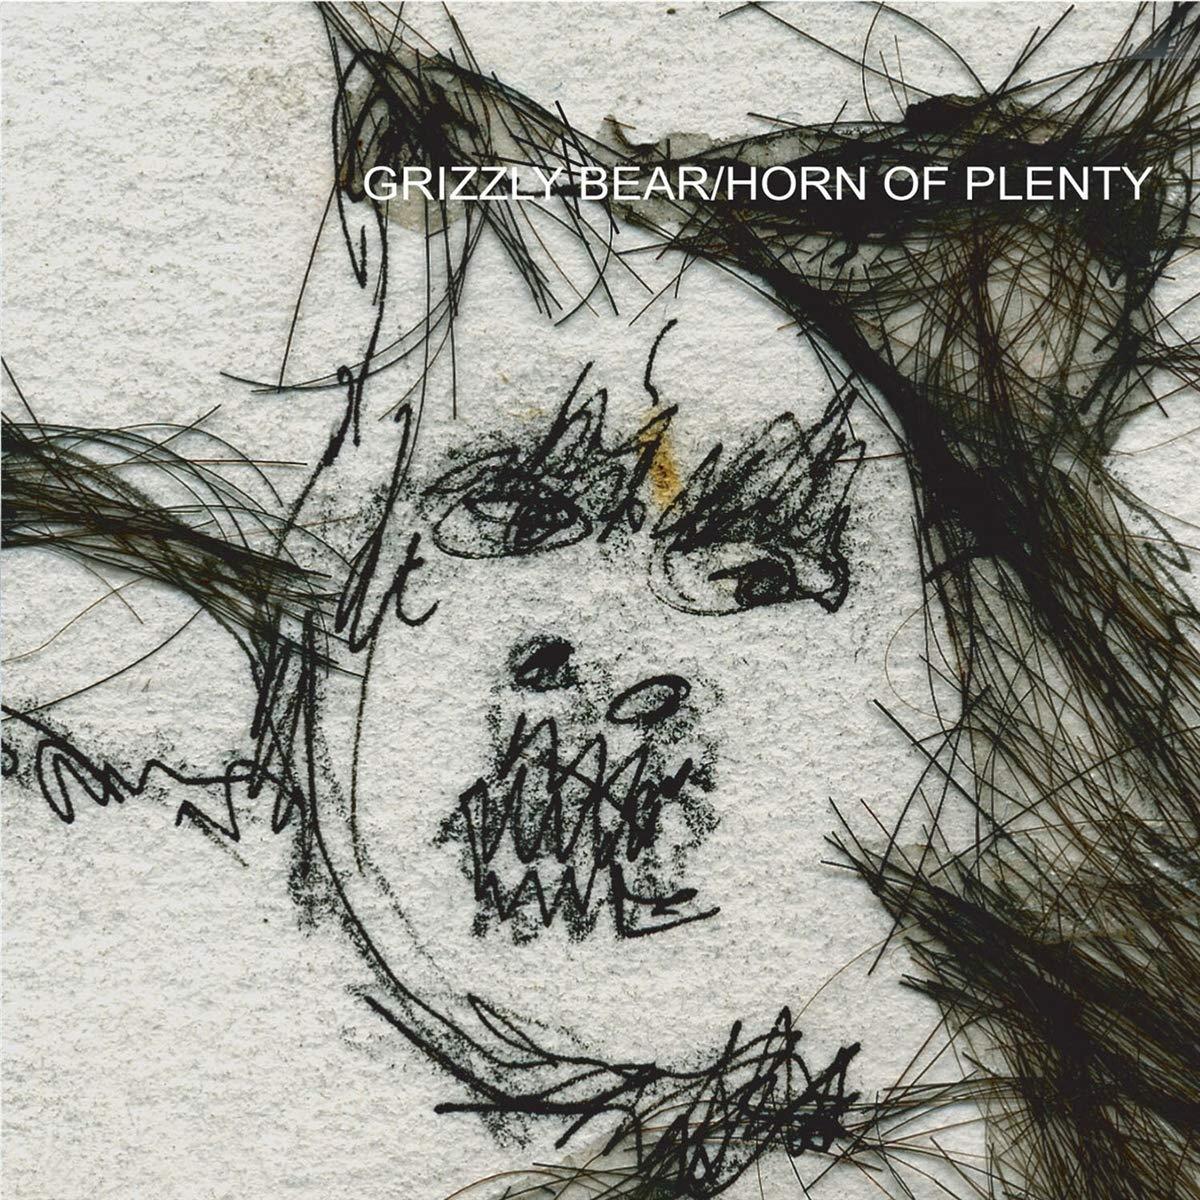 Grizzly Bear - Horn of Plenty [LTD LP]